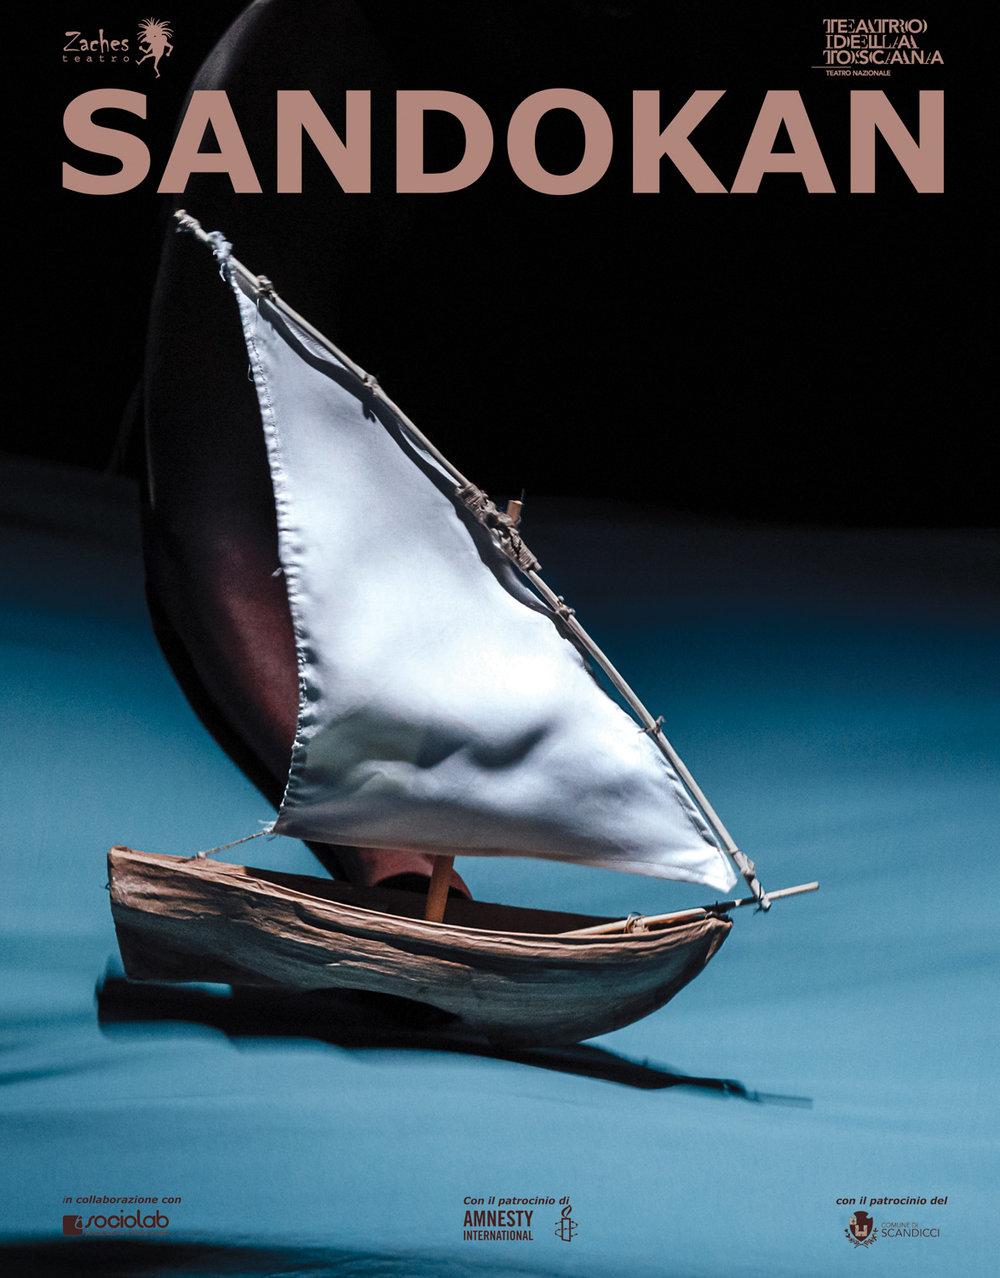 Zaches Teatro | Sandokan